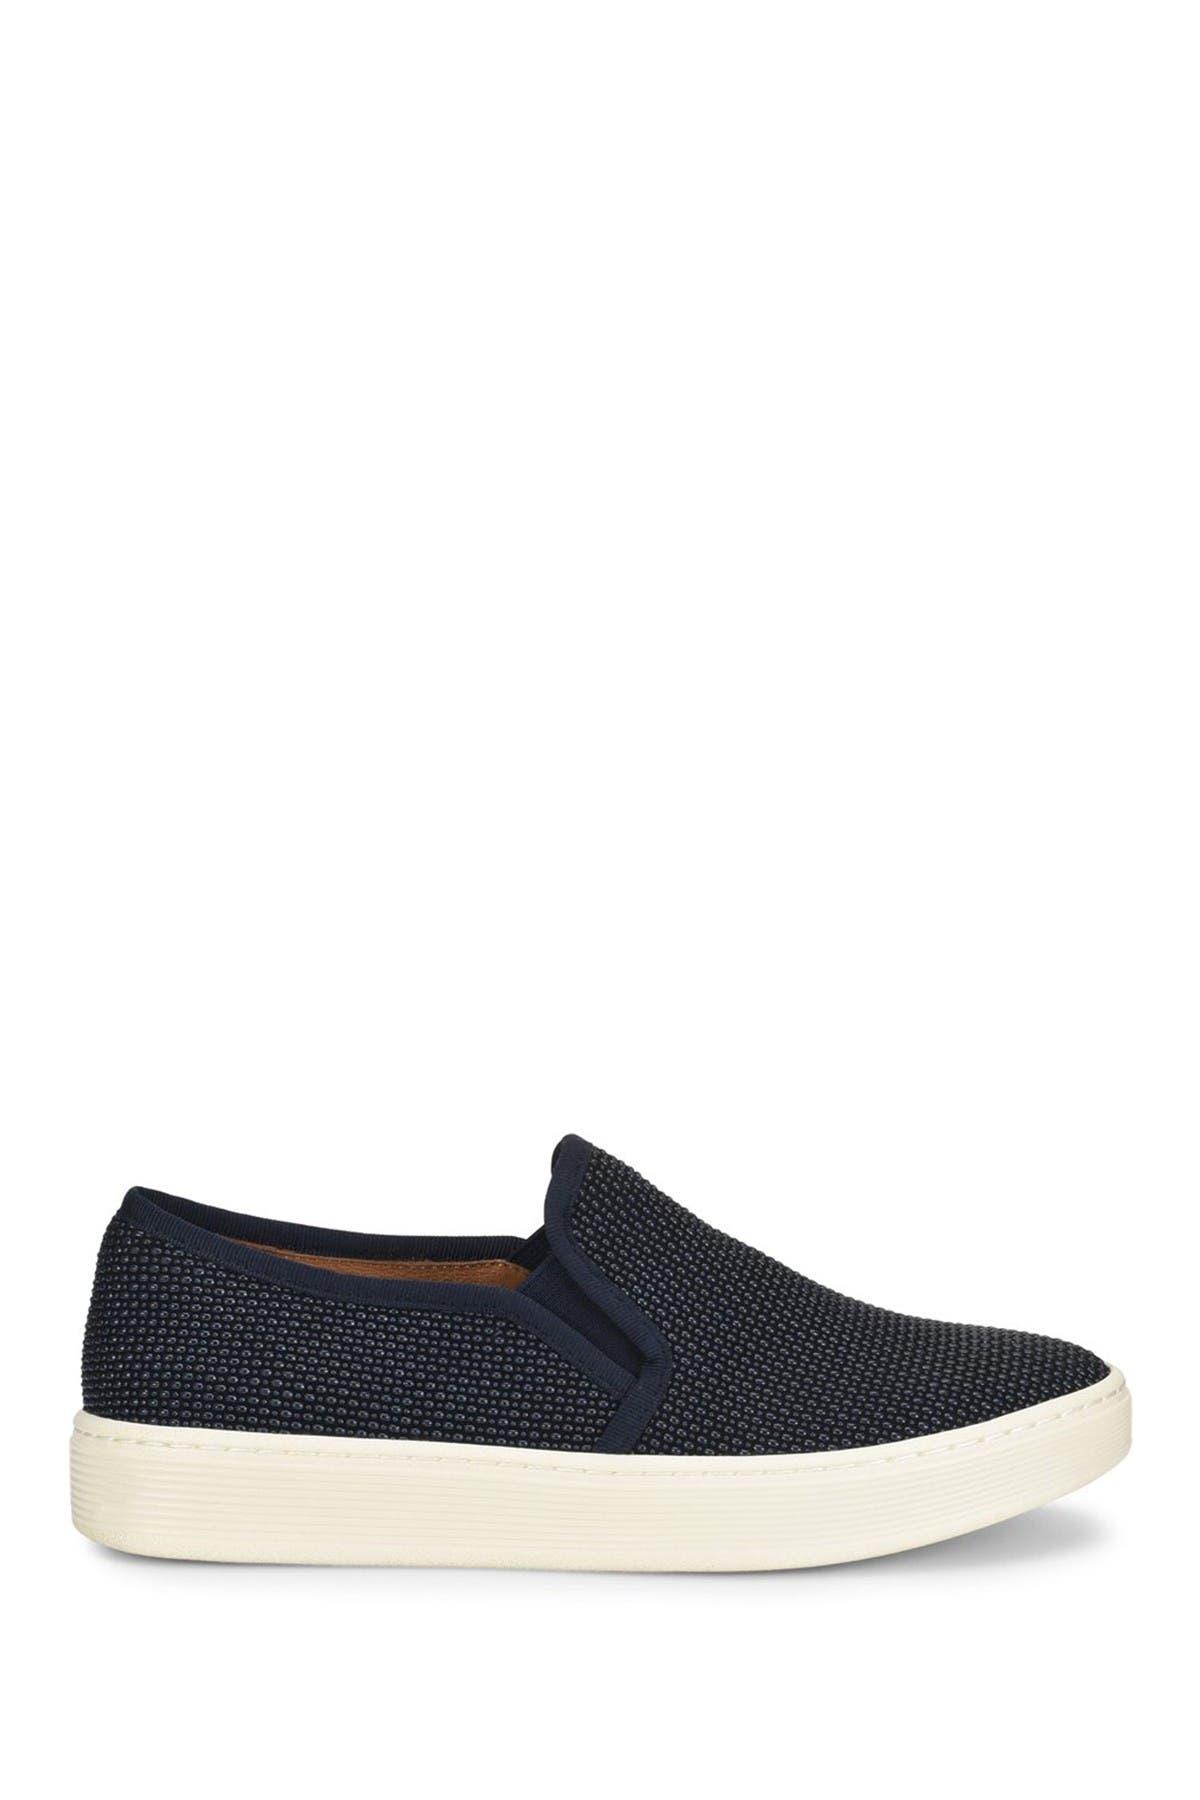 Sofft   Somers Slip-On Sneaker